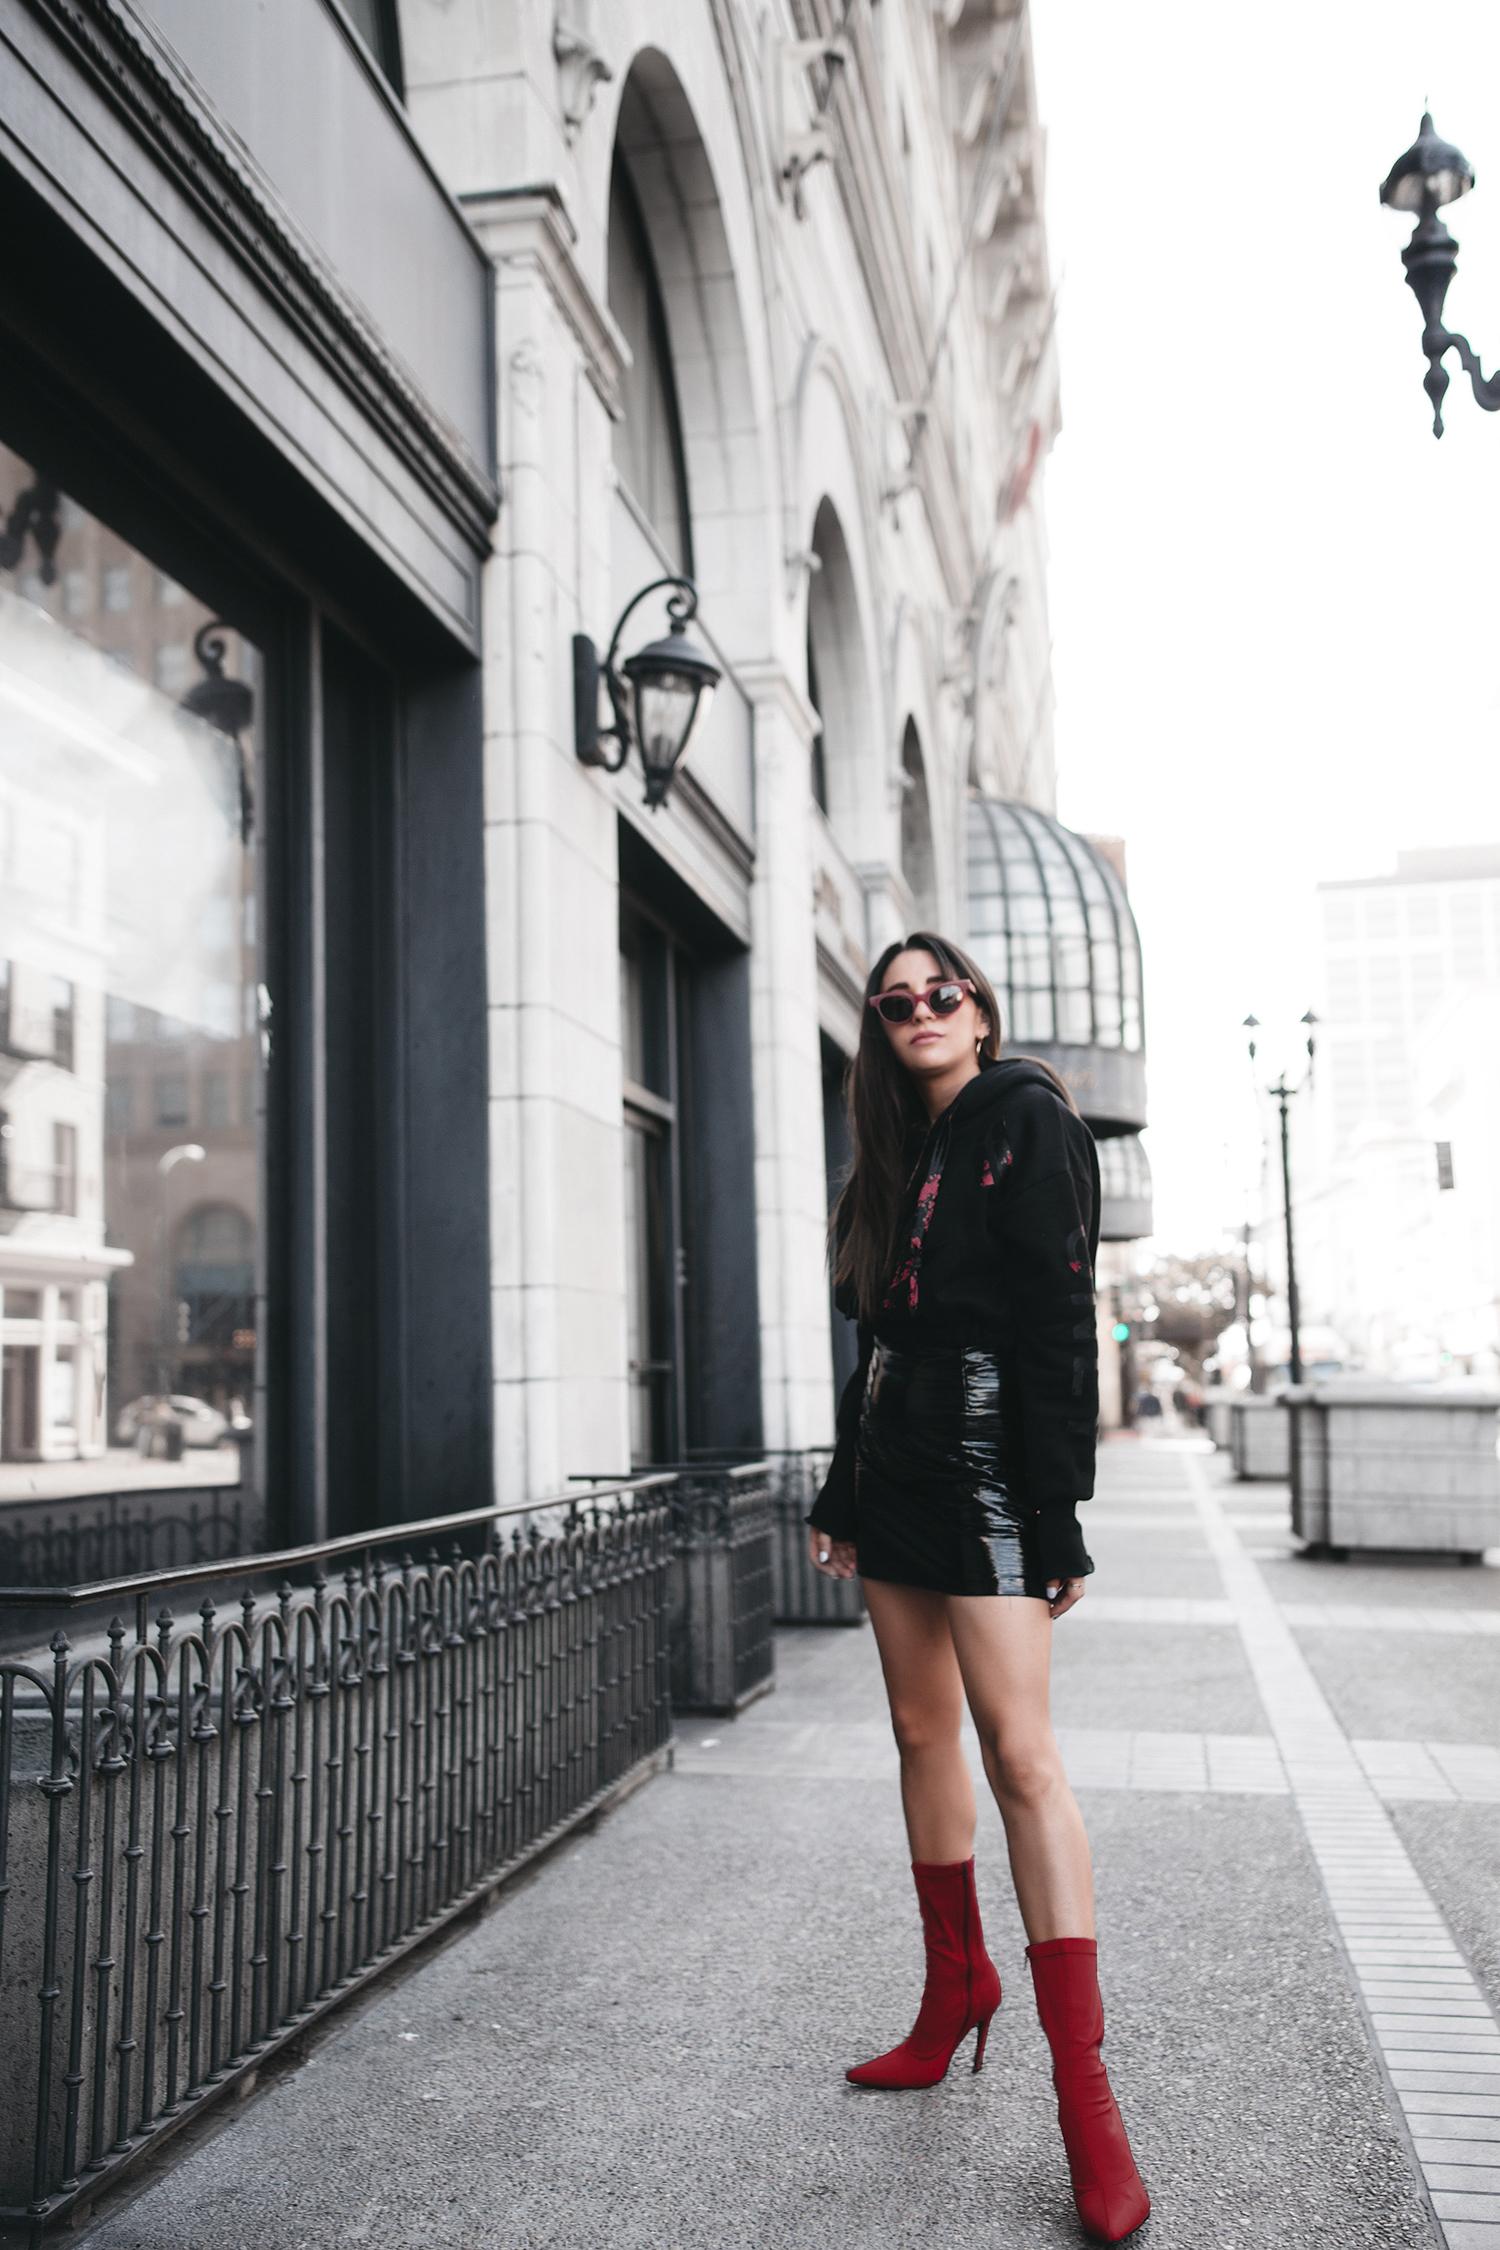 fashionlush, blog photography tips